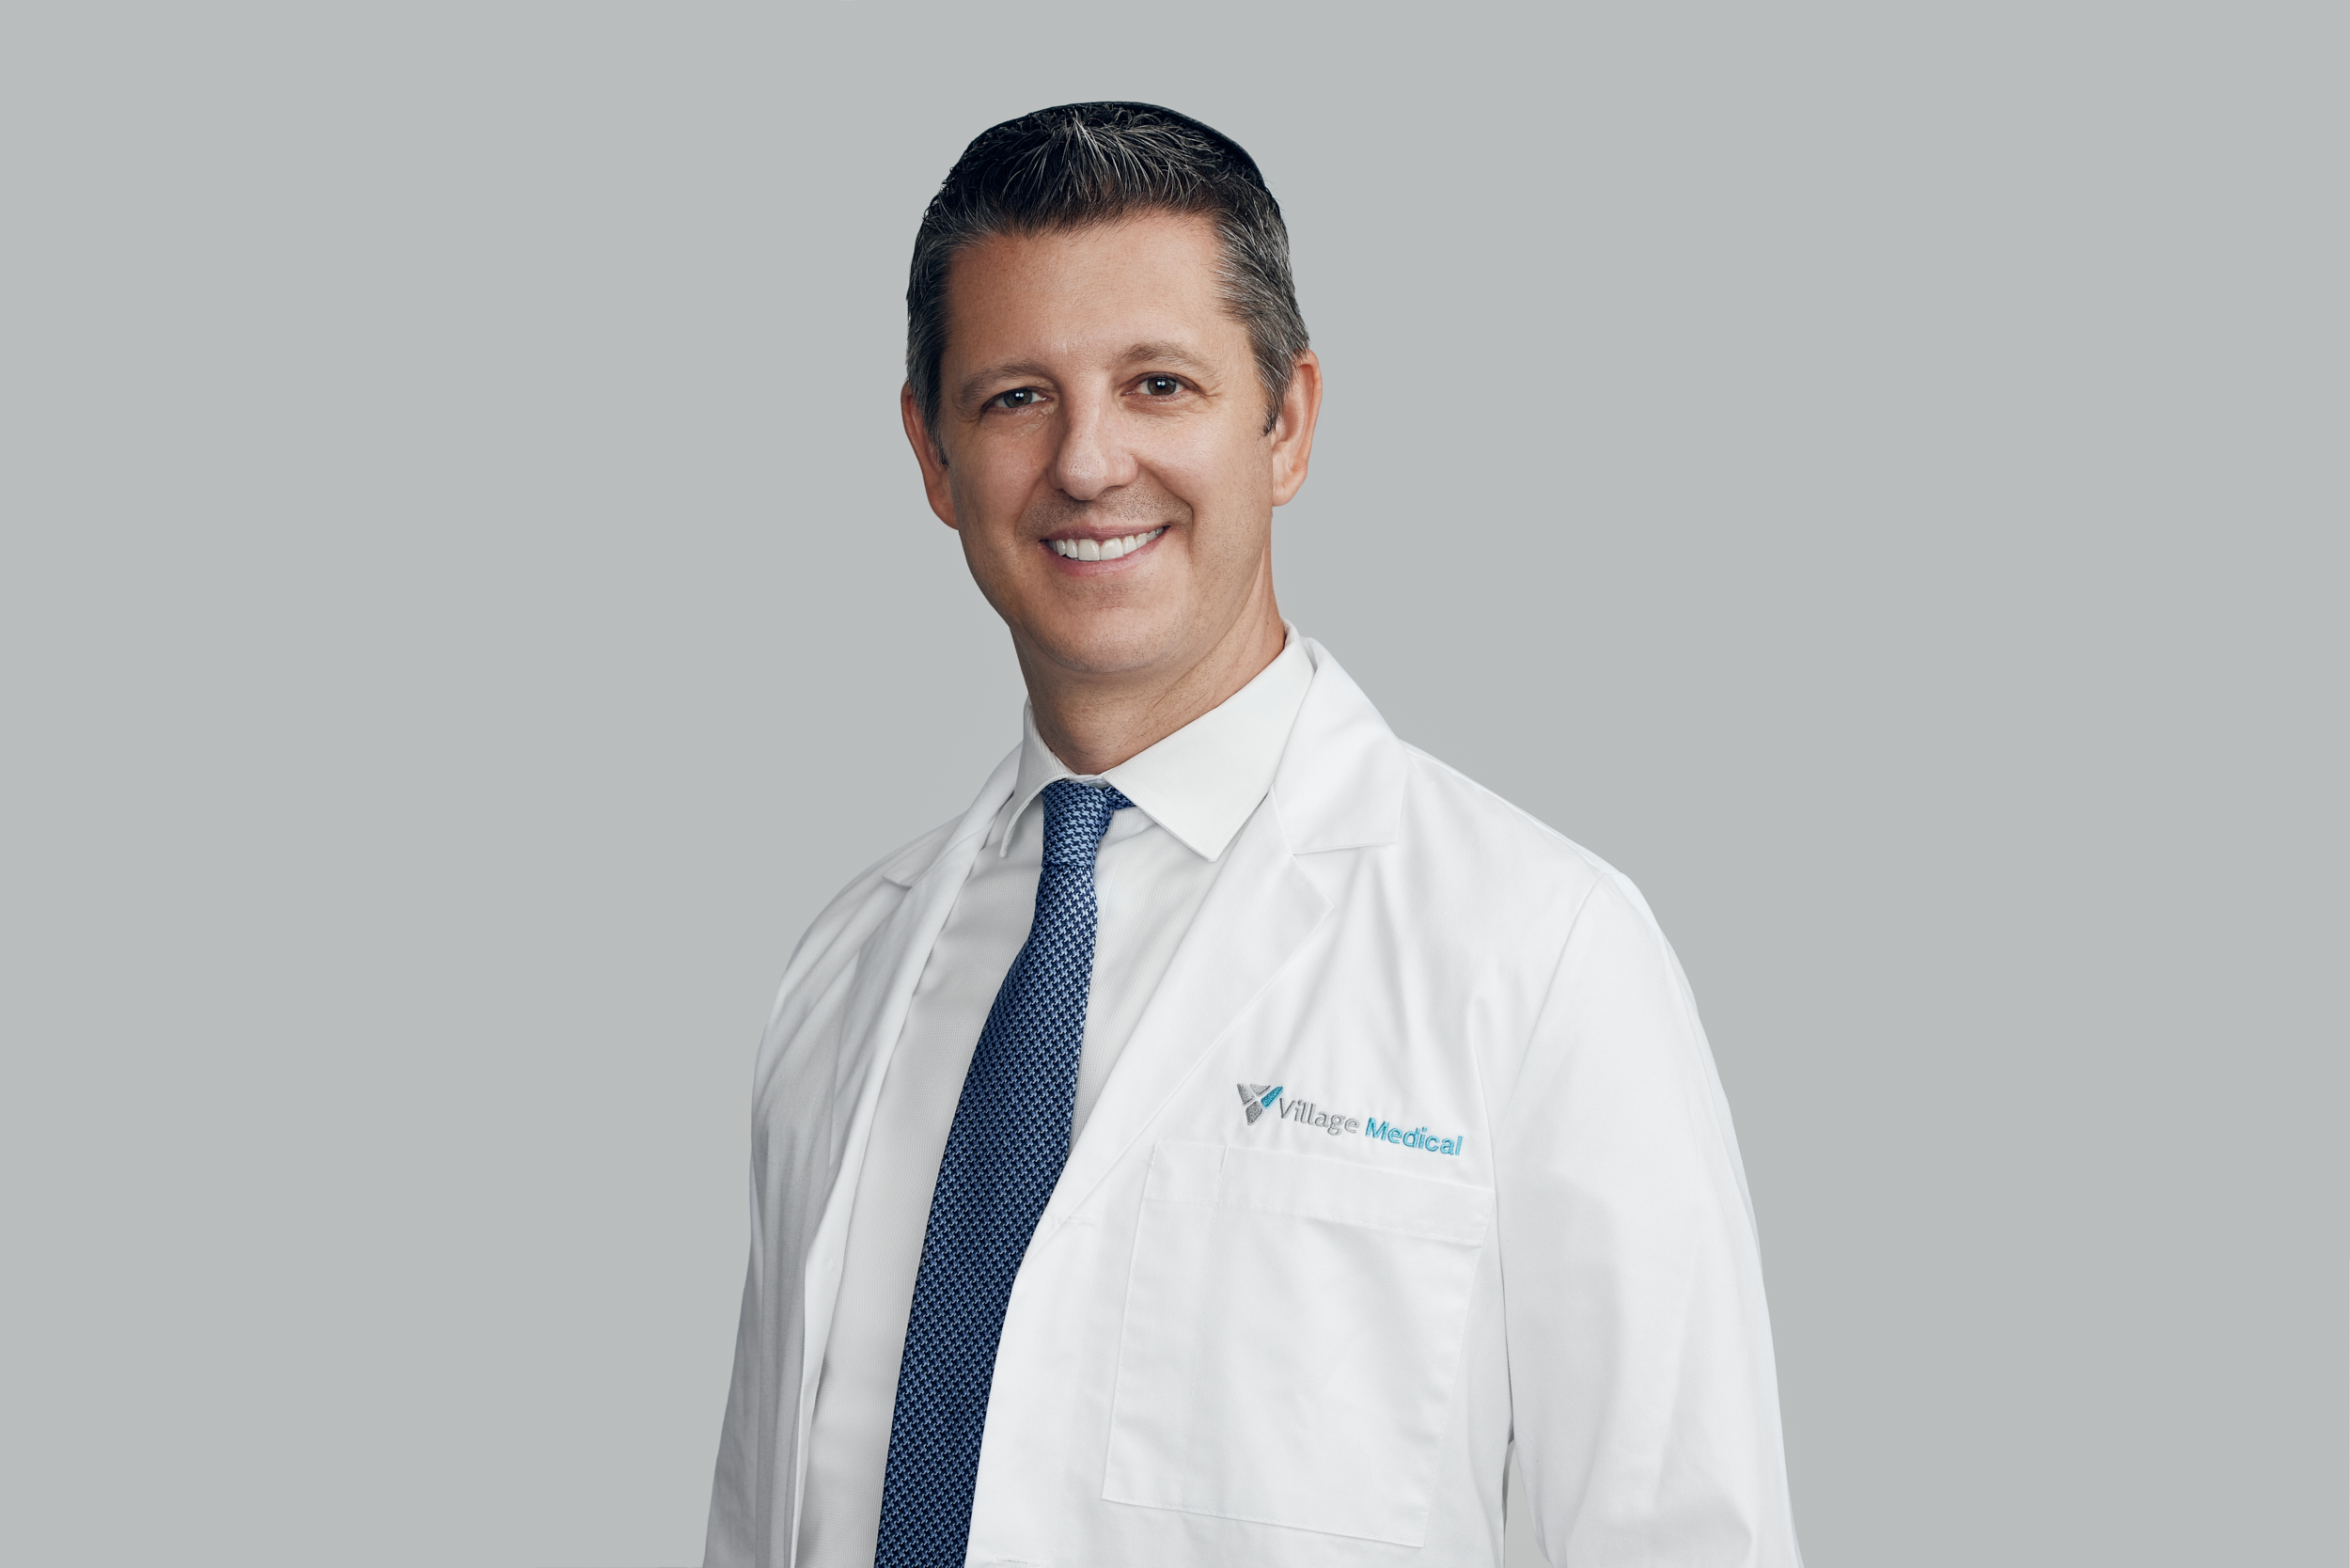 Adam Milman, MD